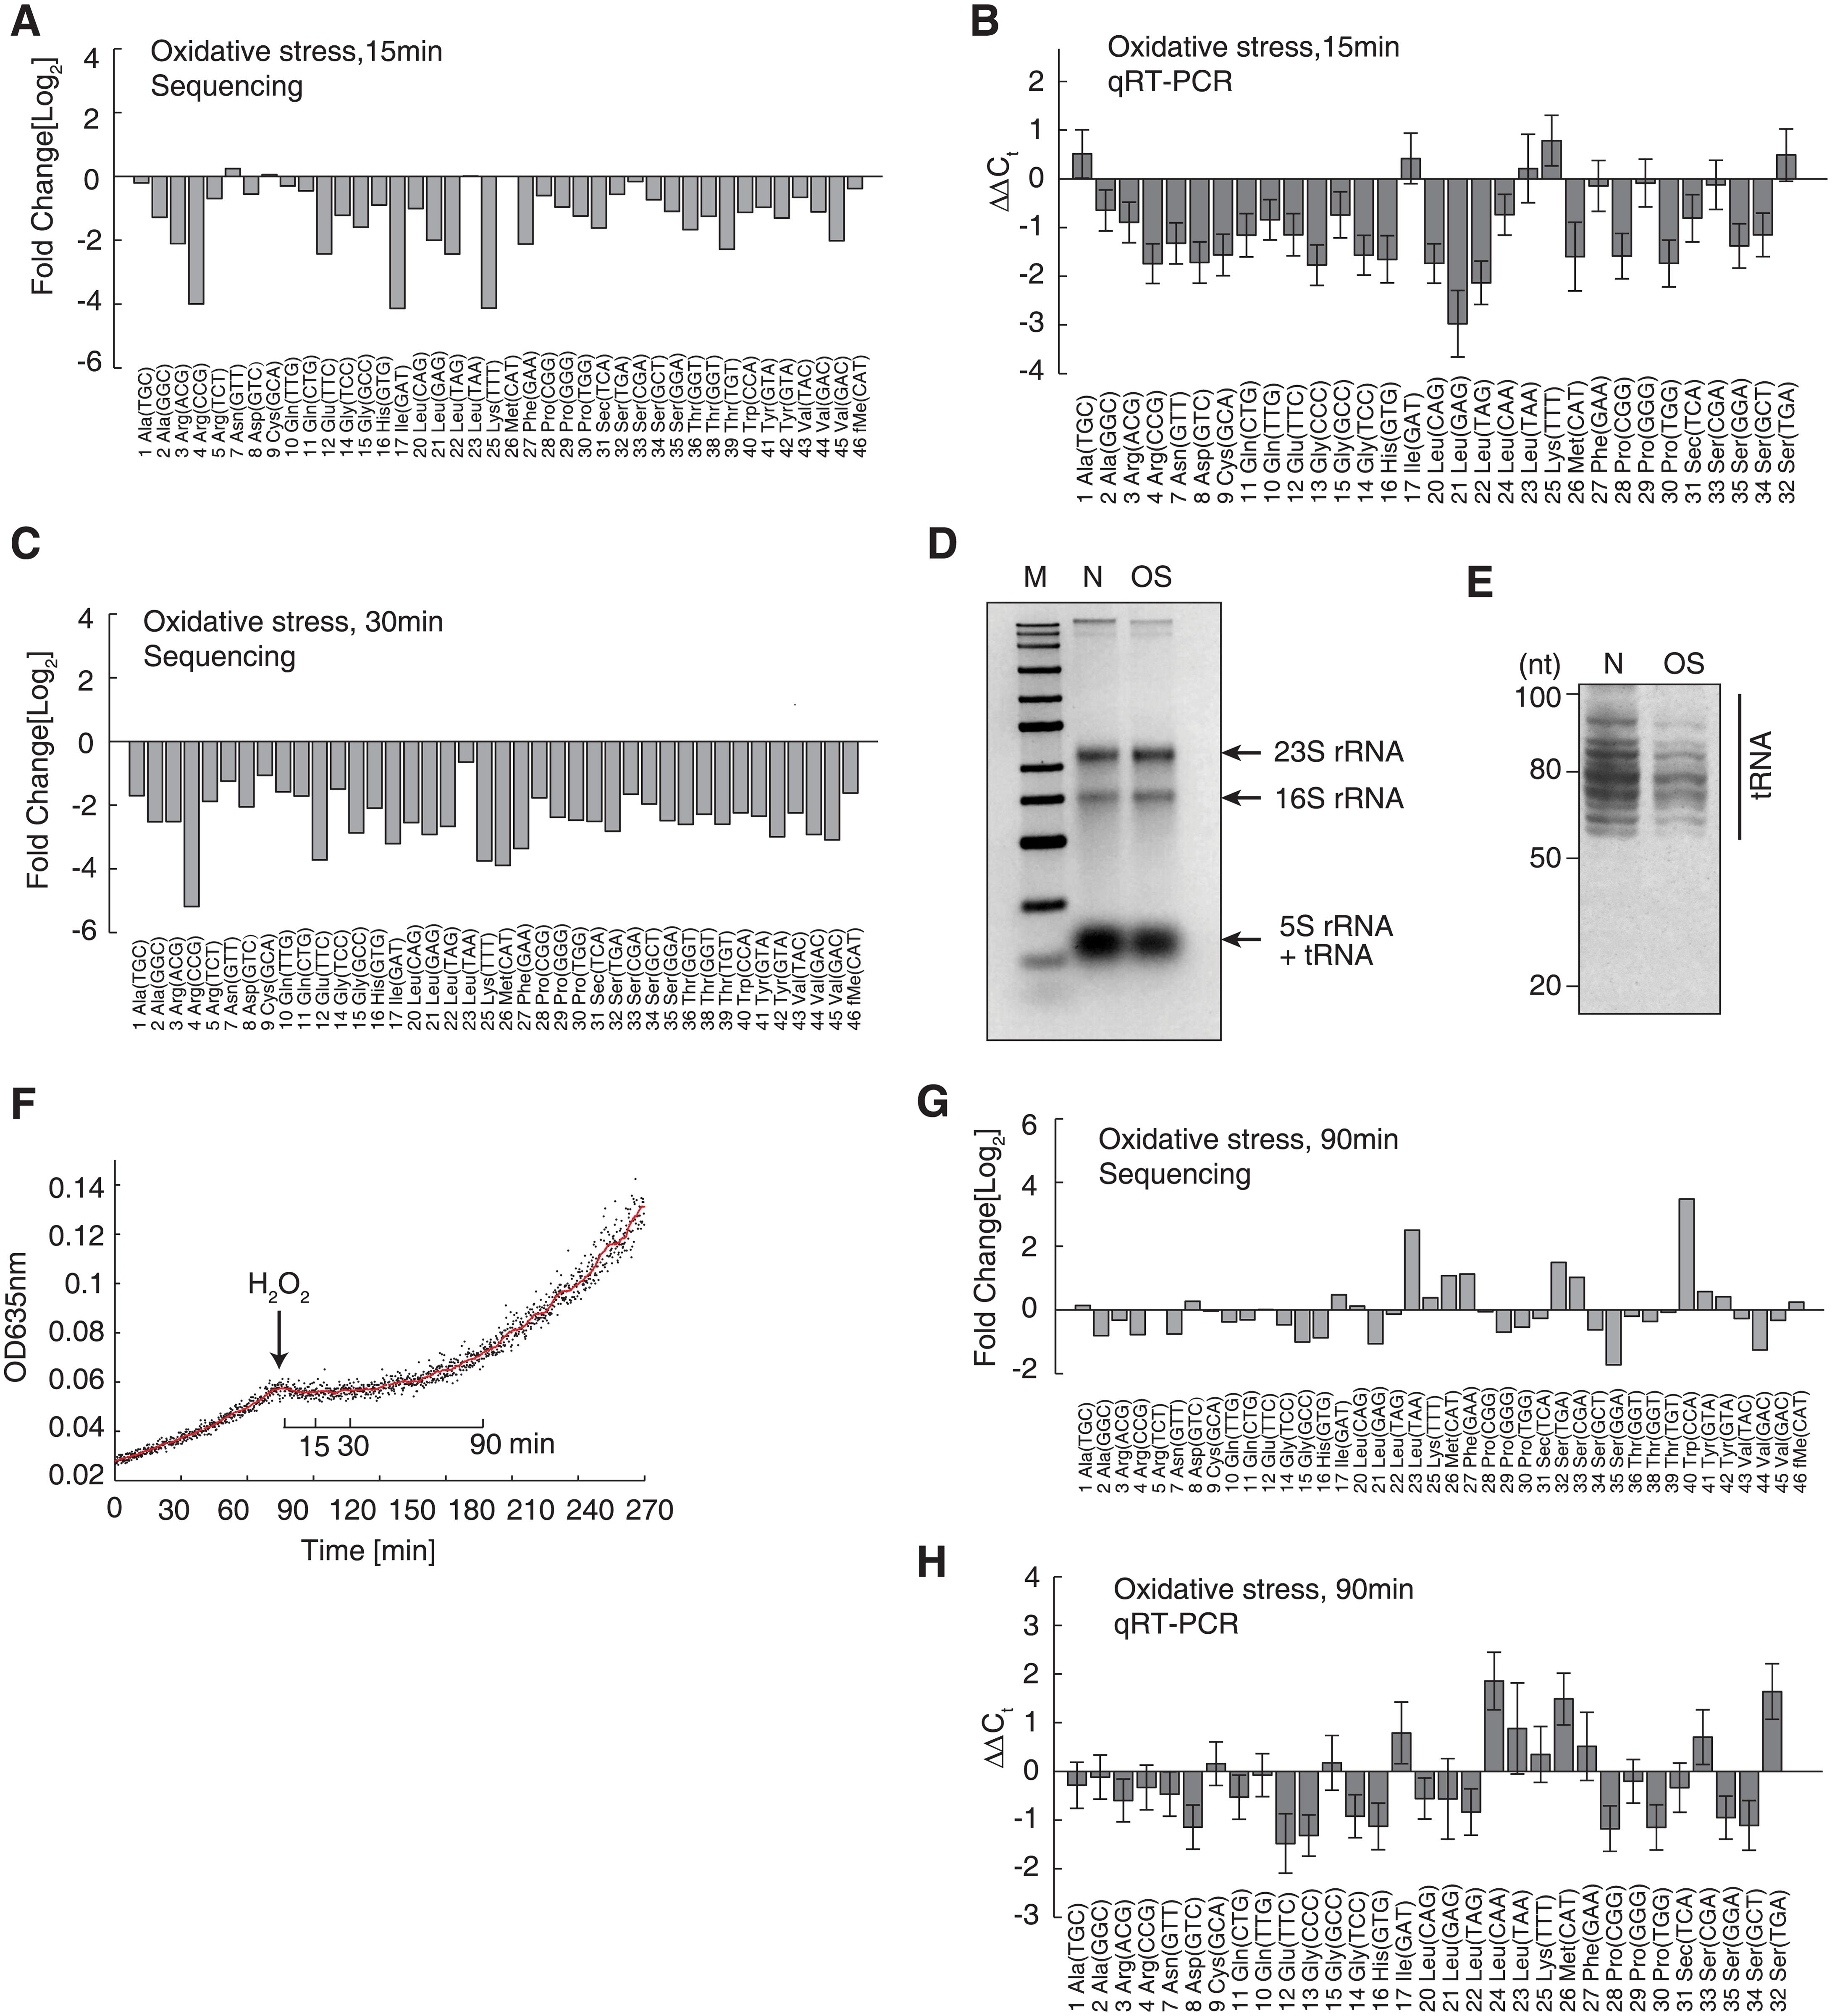 Decrease of full-length tRNAs under oxidative stress.